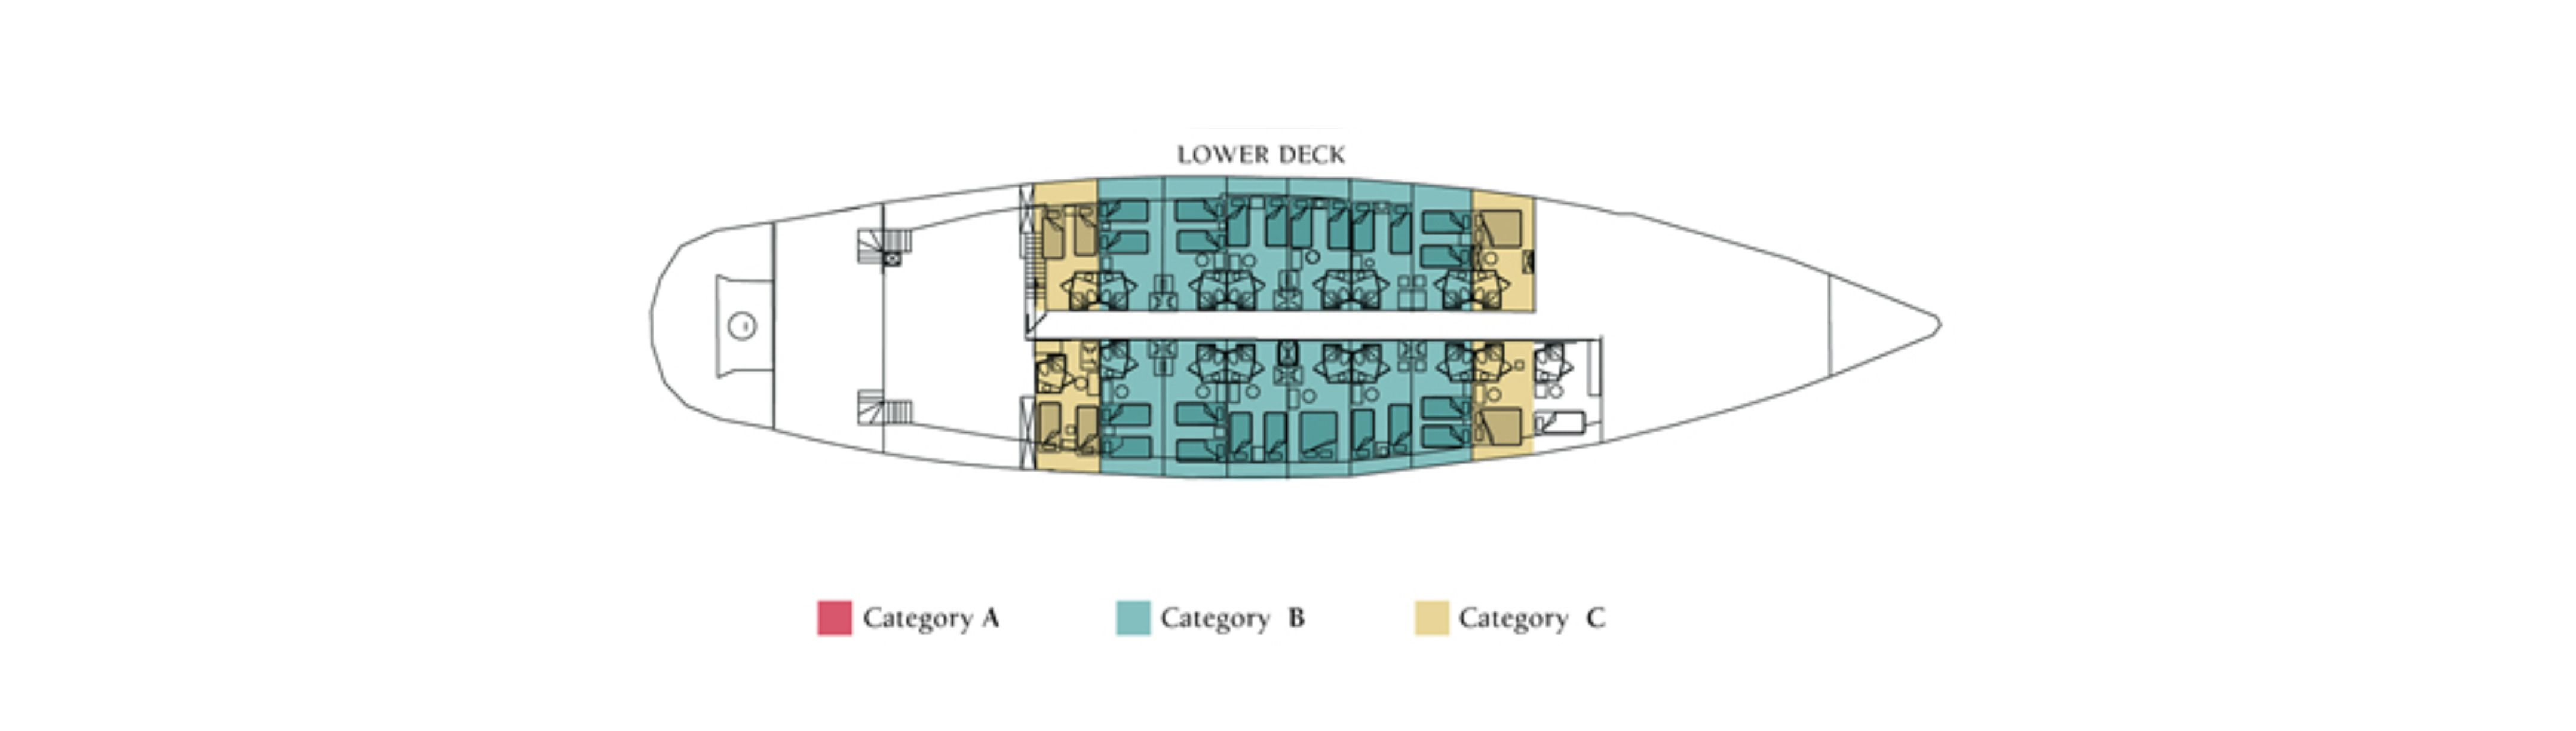 M/S Panorama, Lower Deck